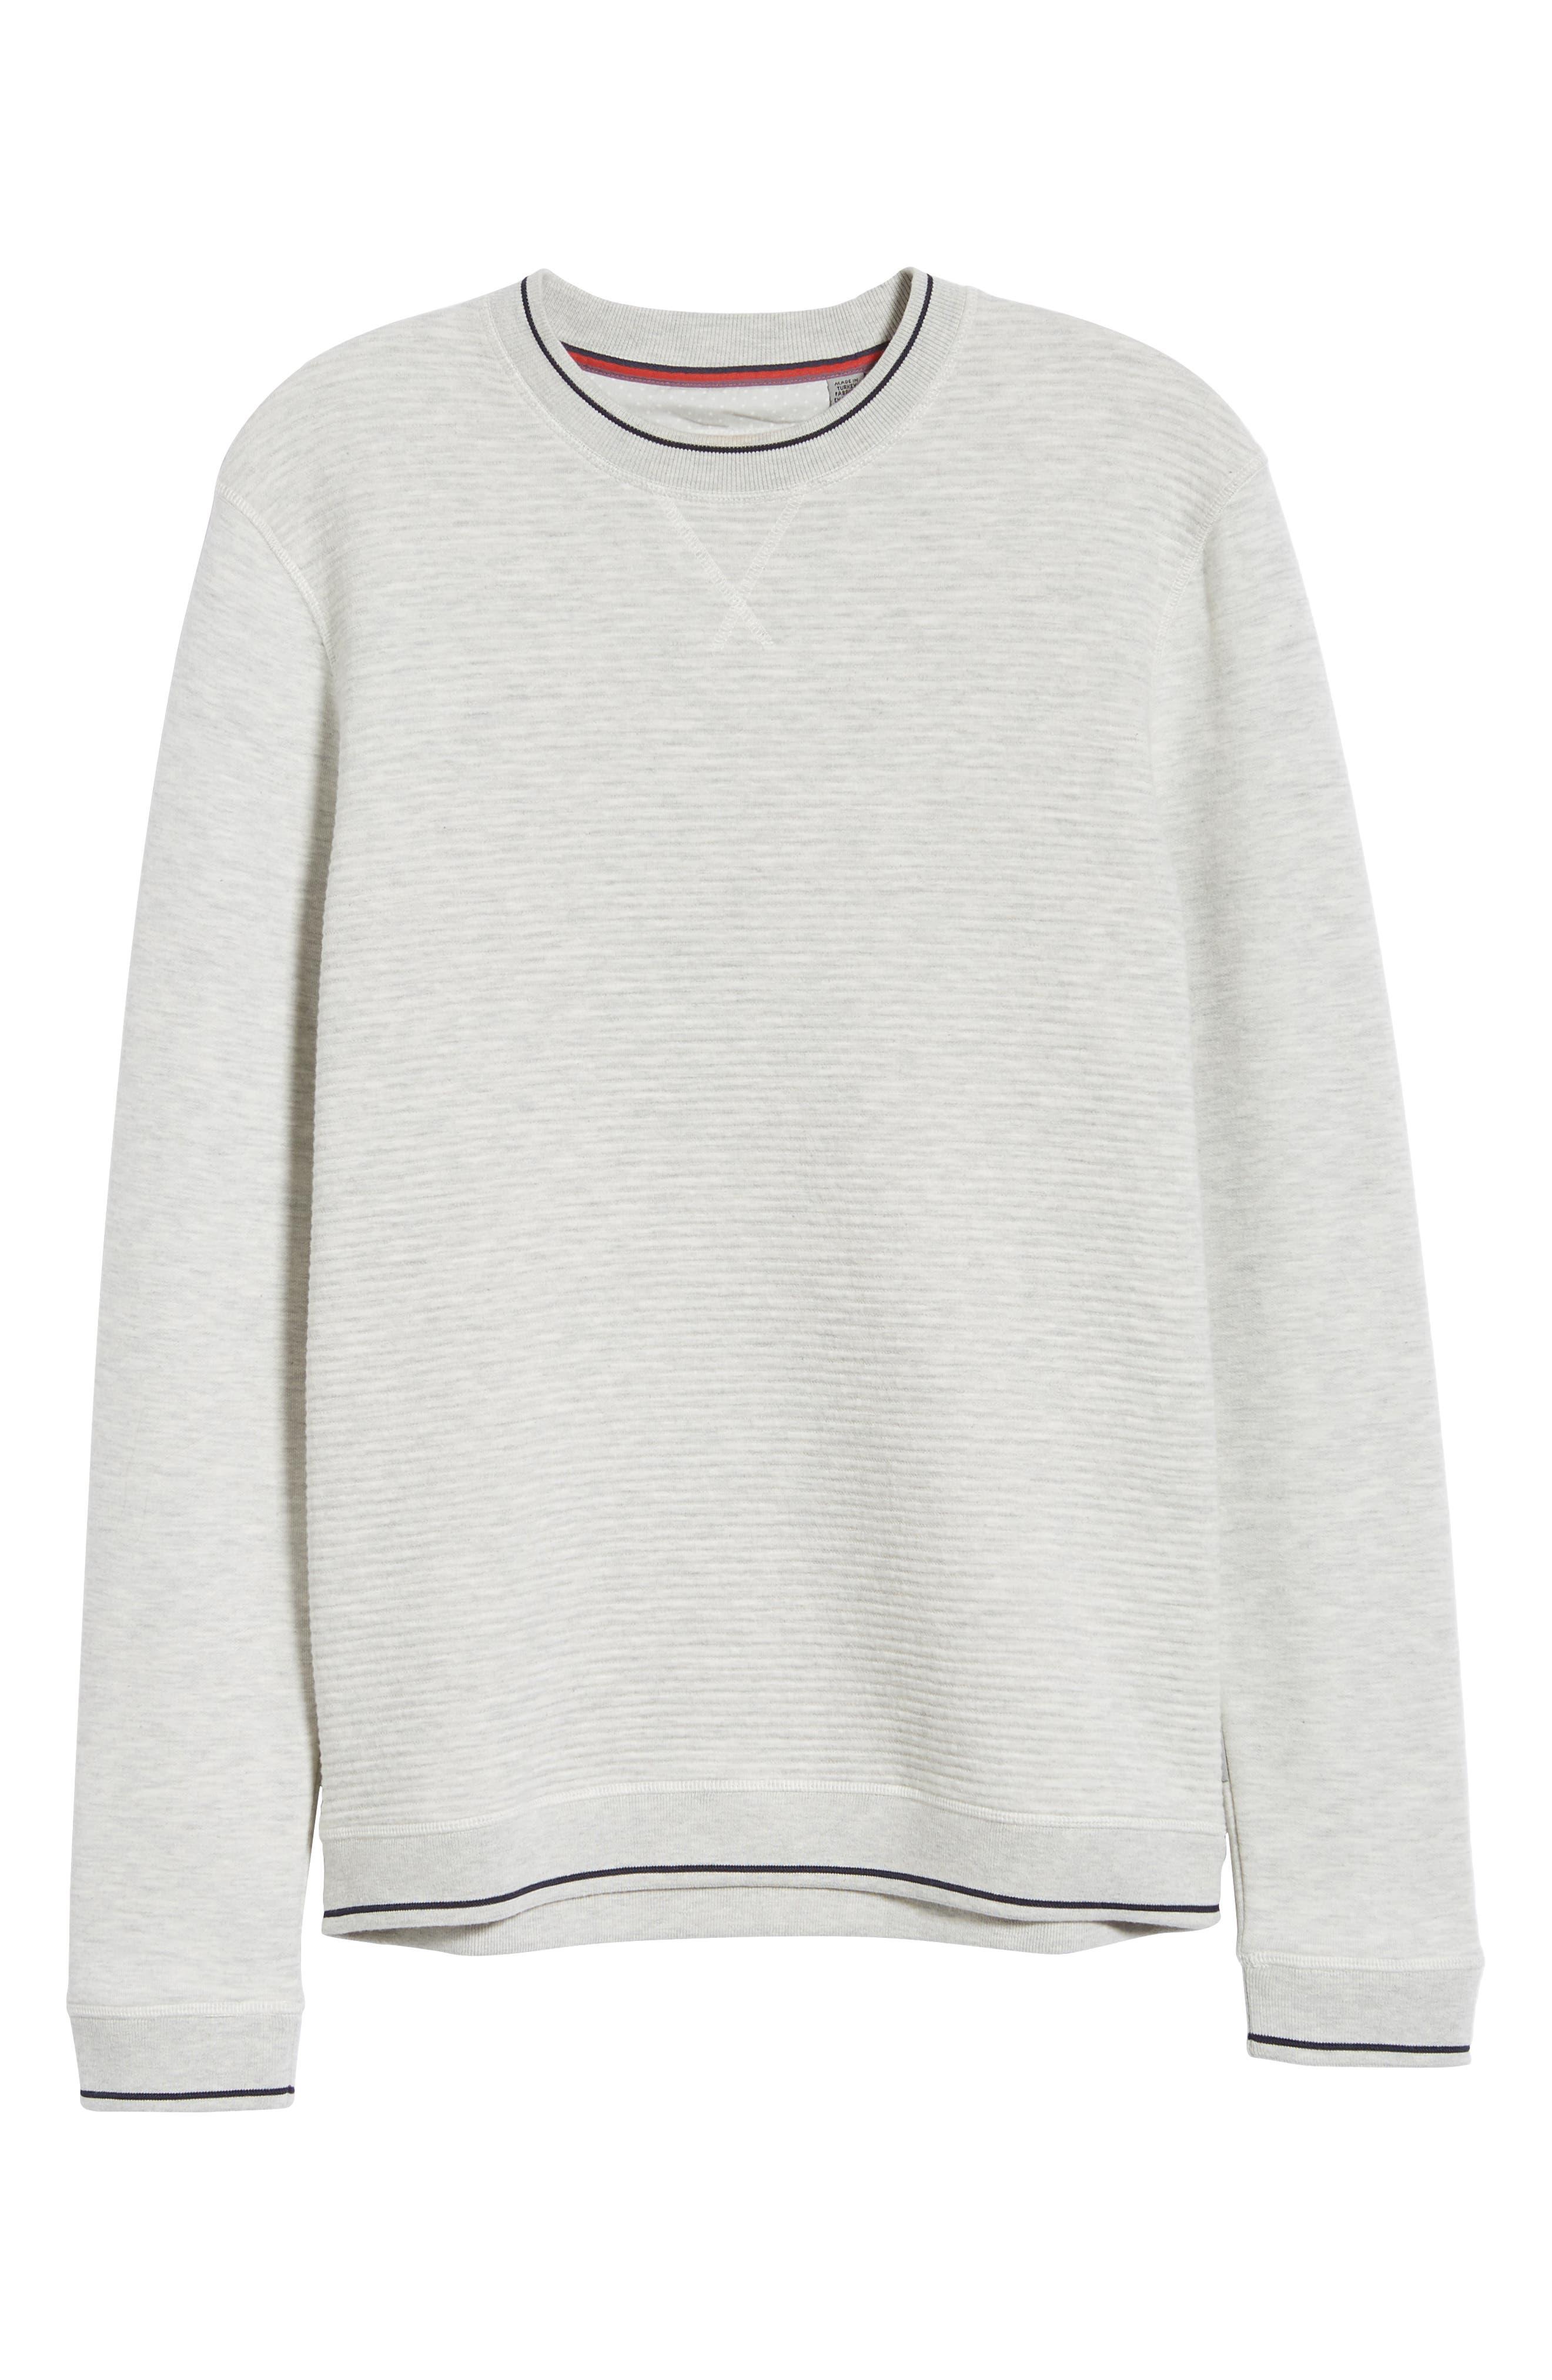 Magiics Slim Fit Quilted Sweatshirt,                             Alternate thumbnail 6, color,                             LIGHT GREY